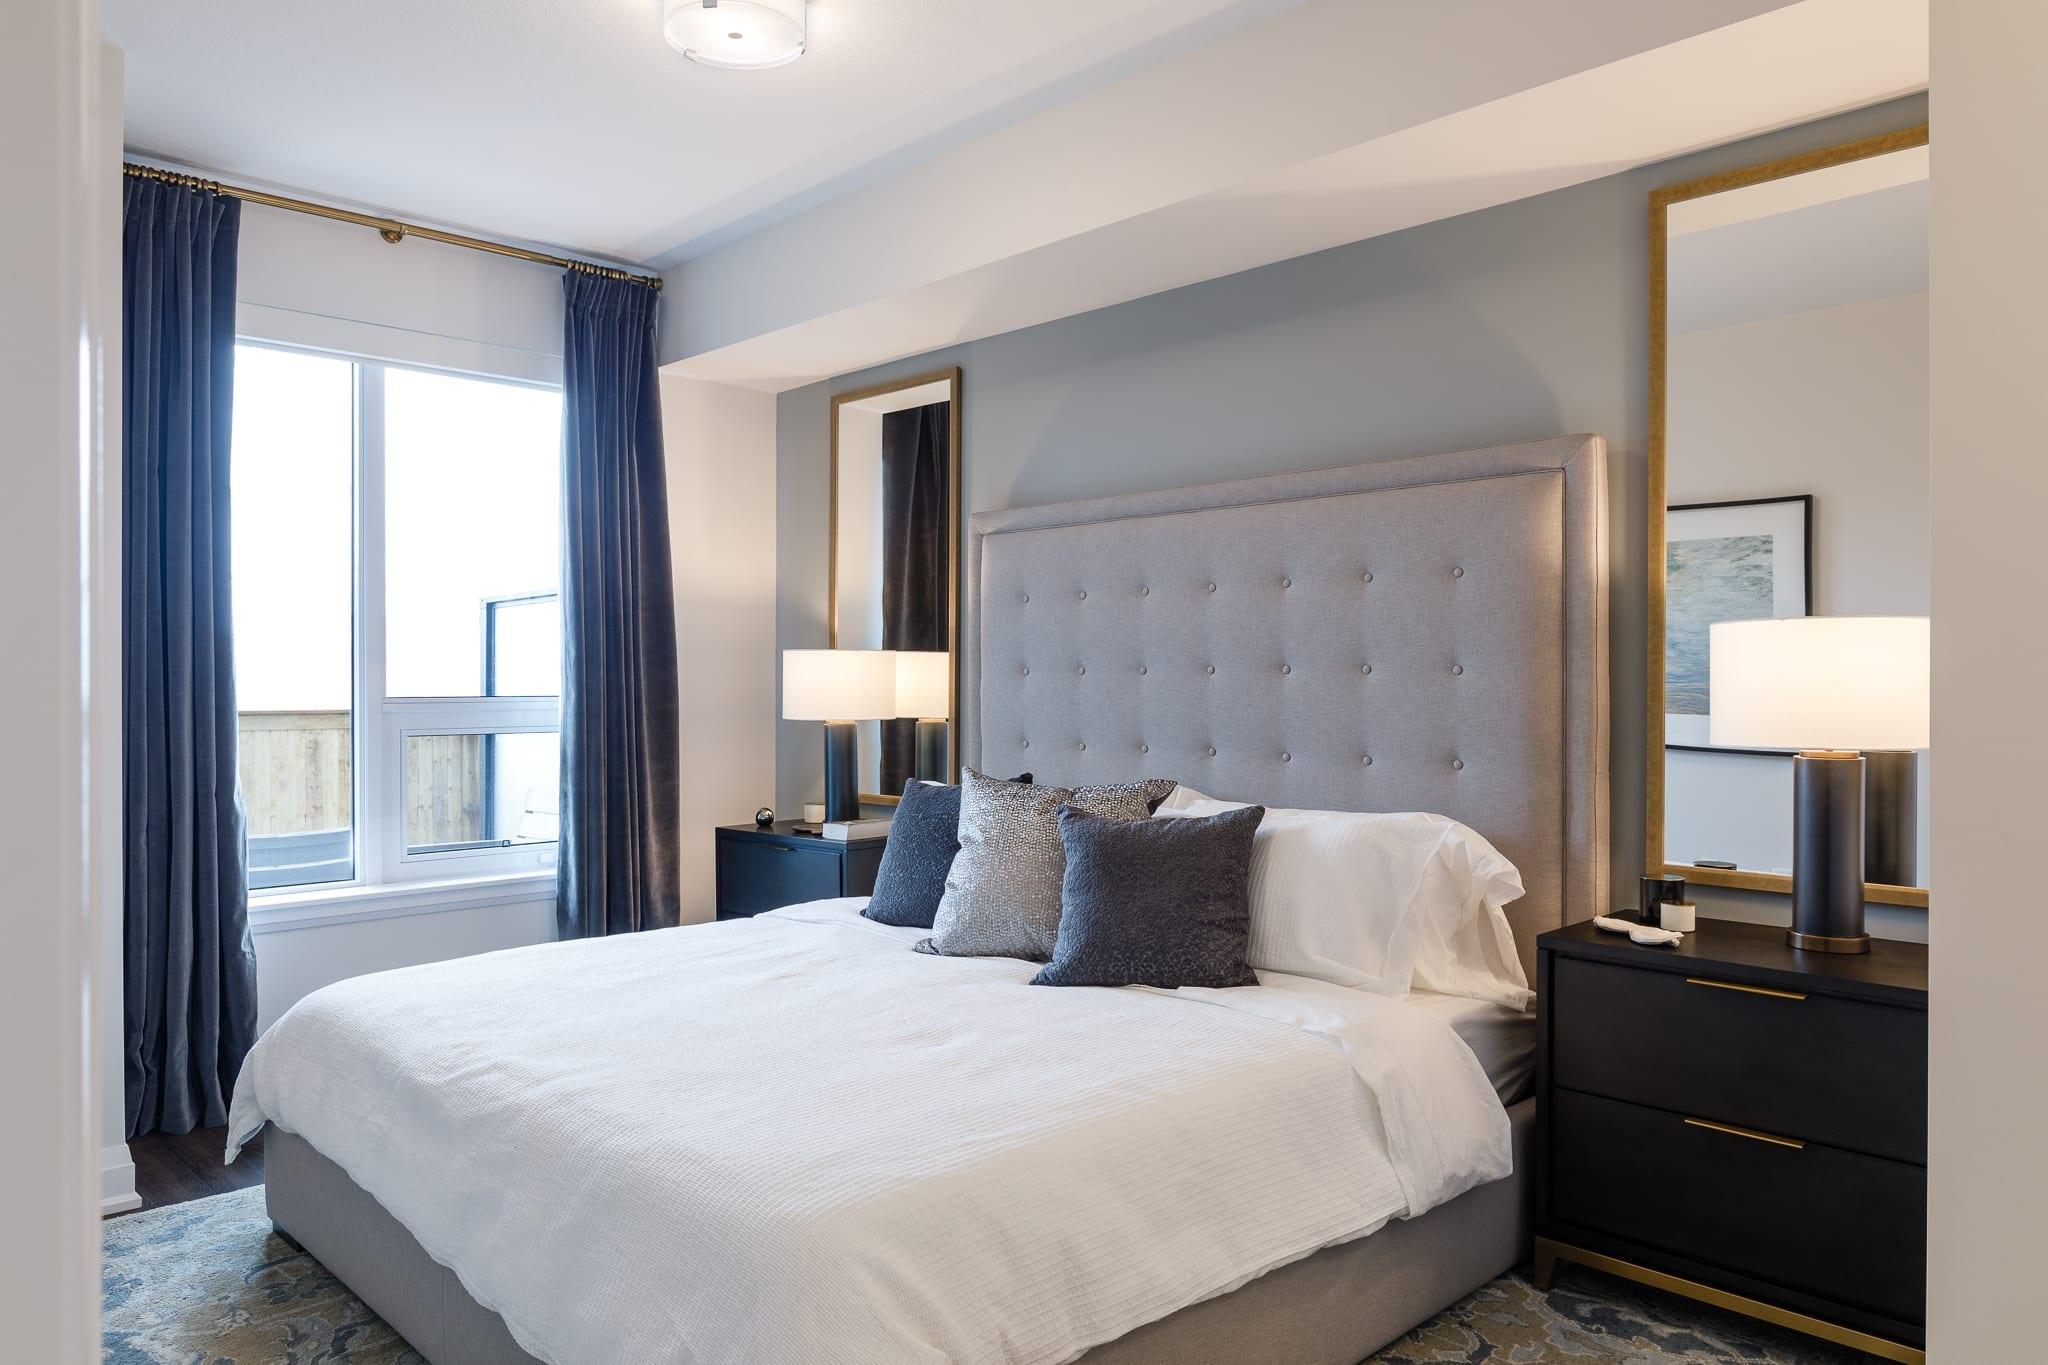 Taunton bedroom